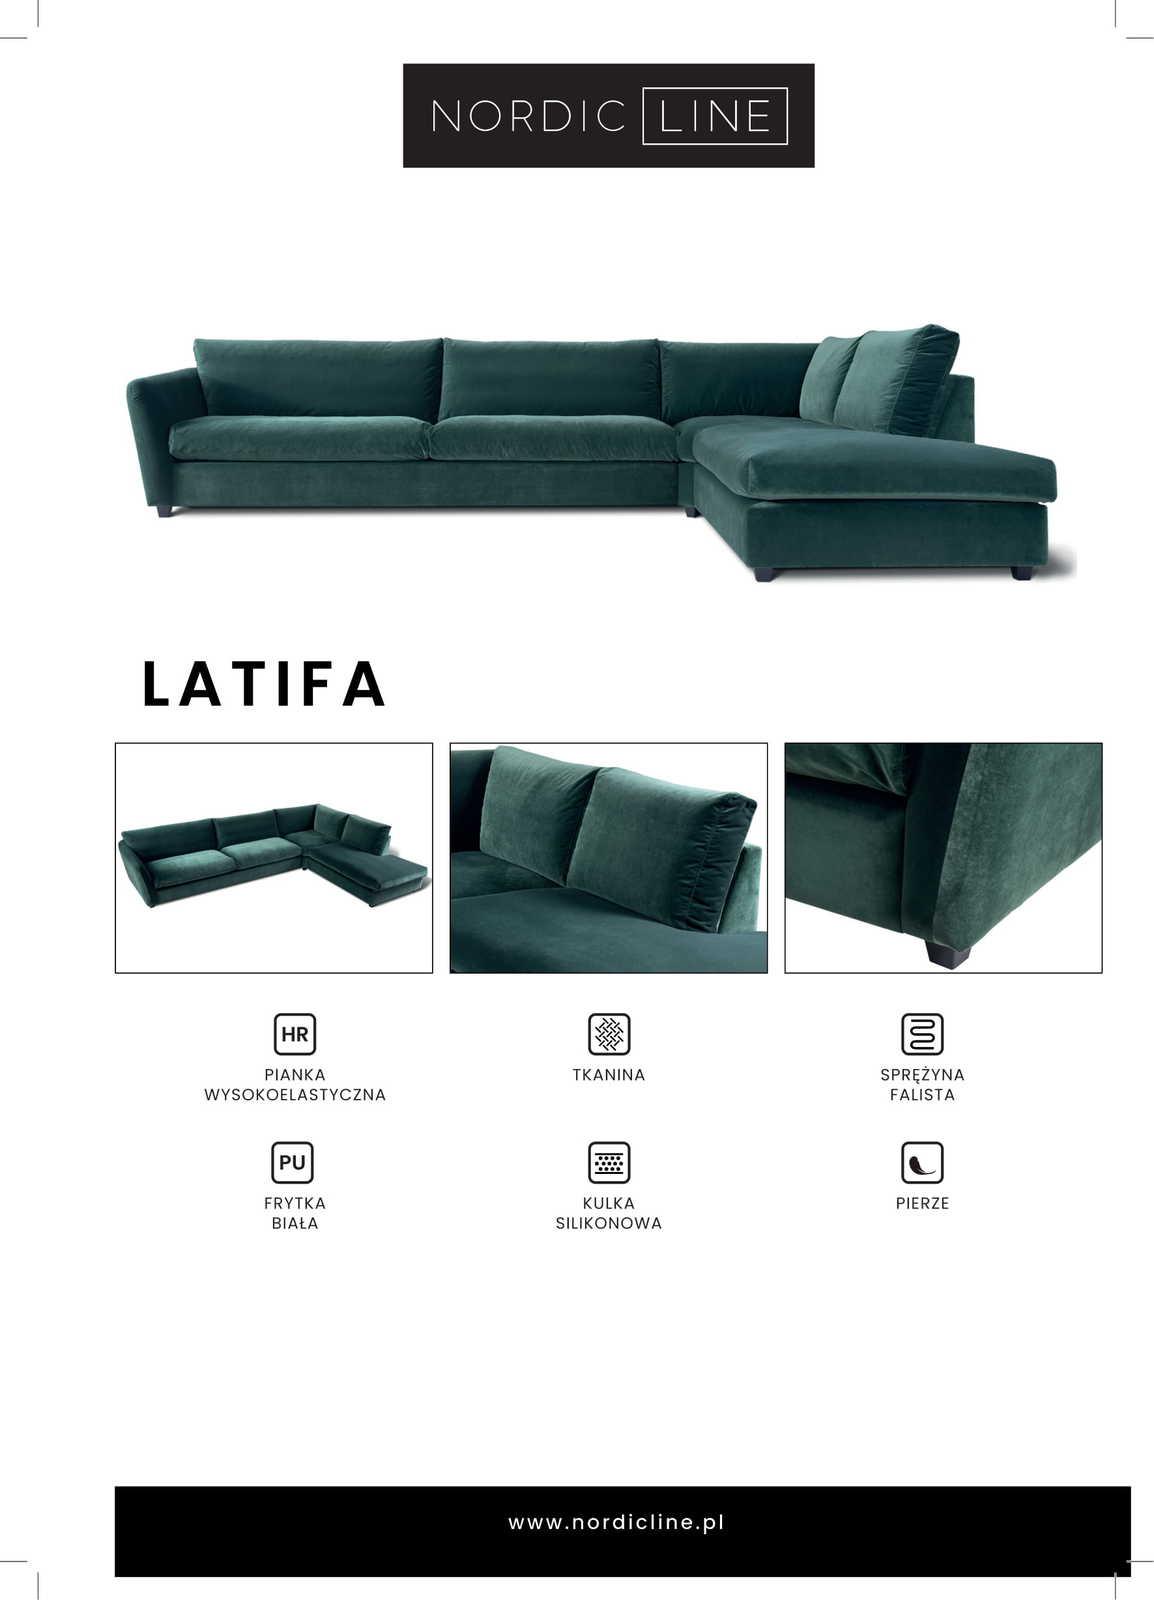 Latifa(krzywe) (5) 1